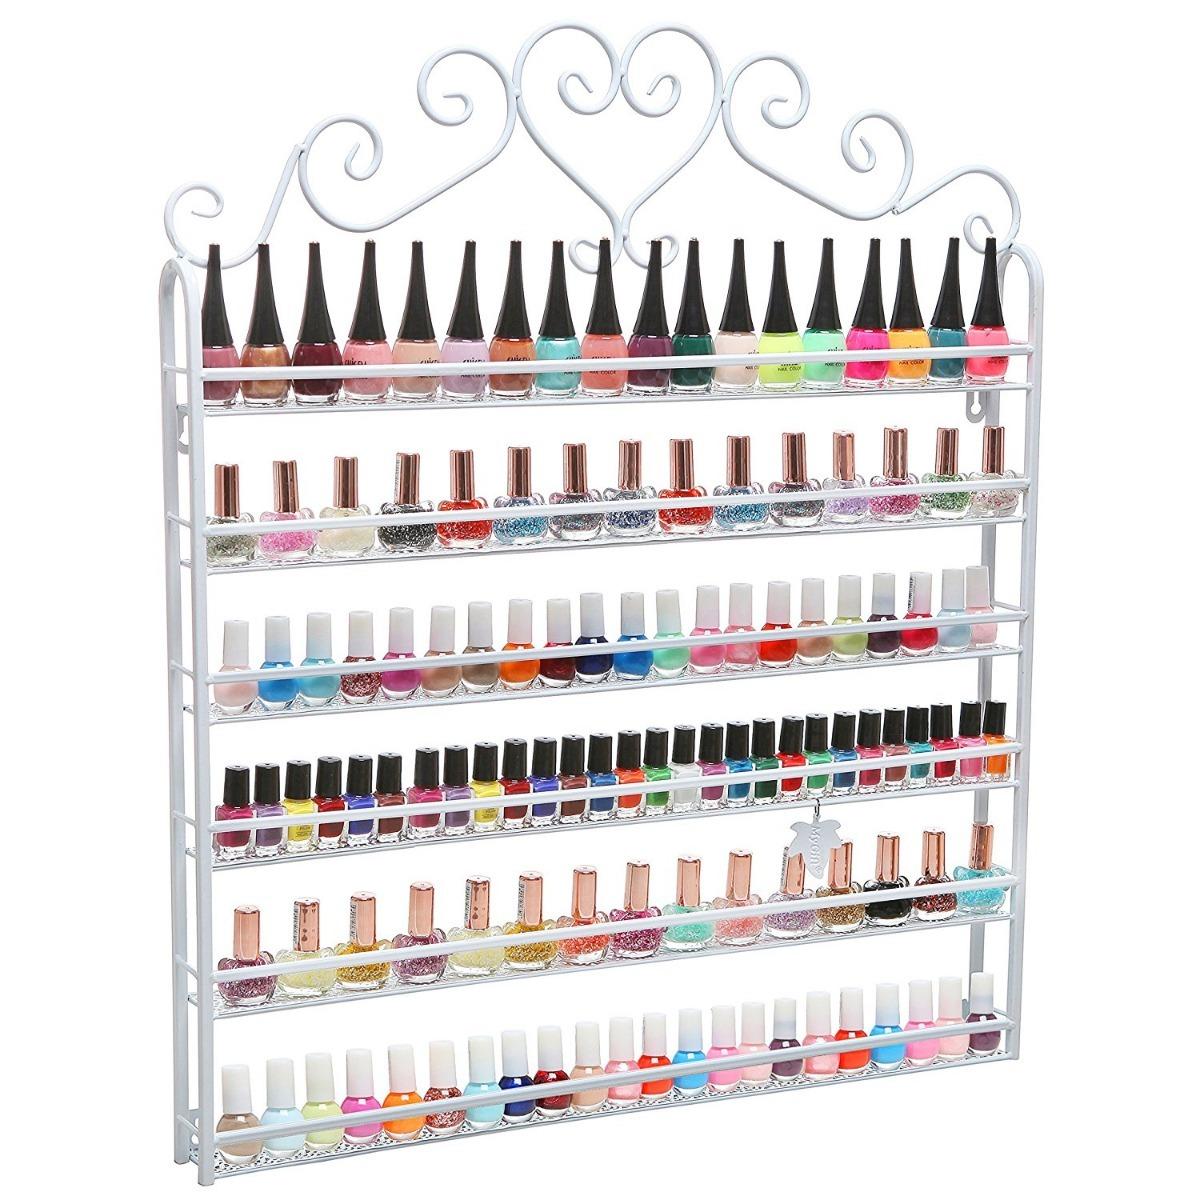 Estante Organizador Esmalte Uñas Salon Decoration Mygift ...